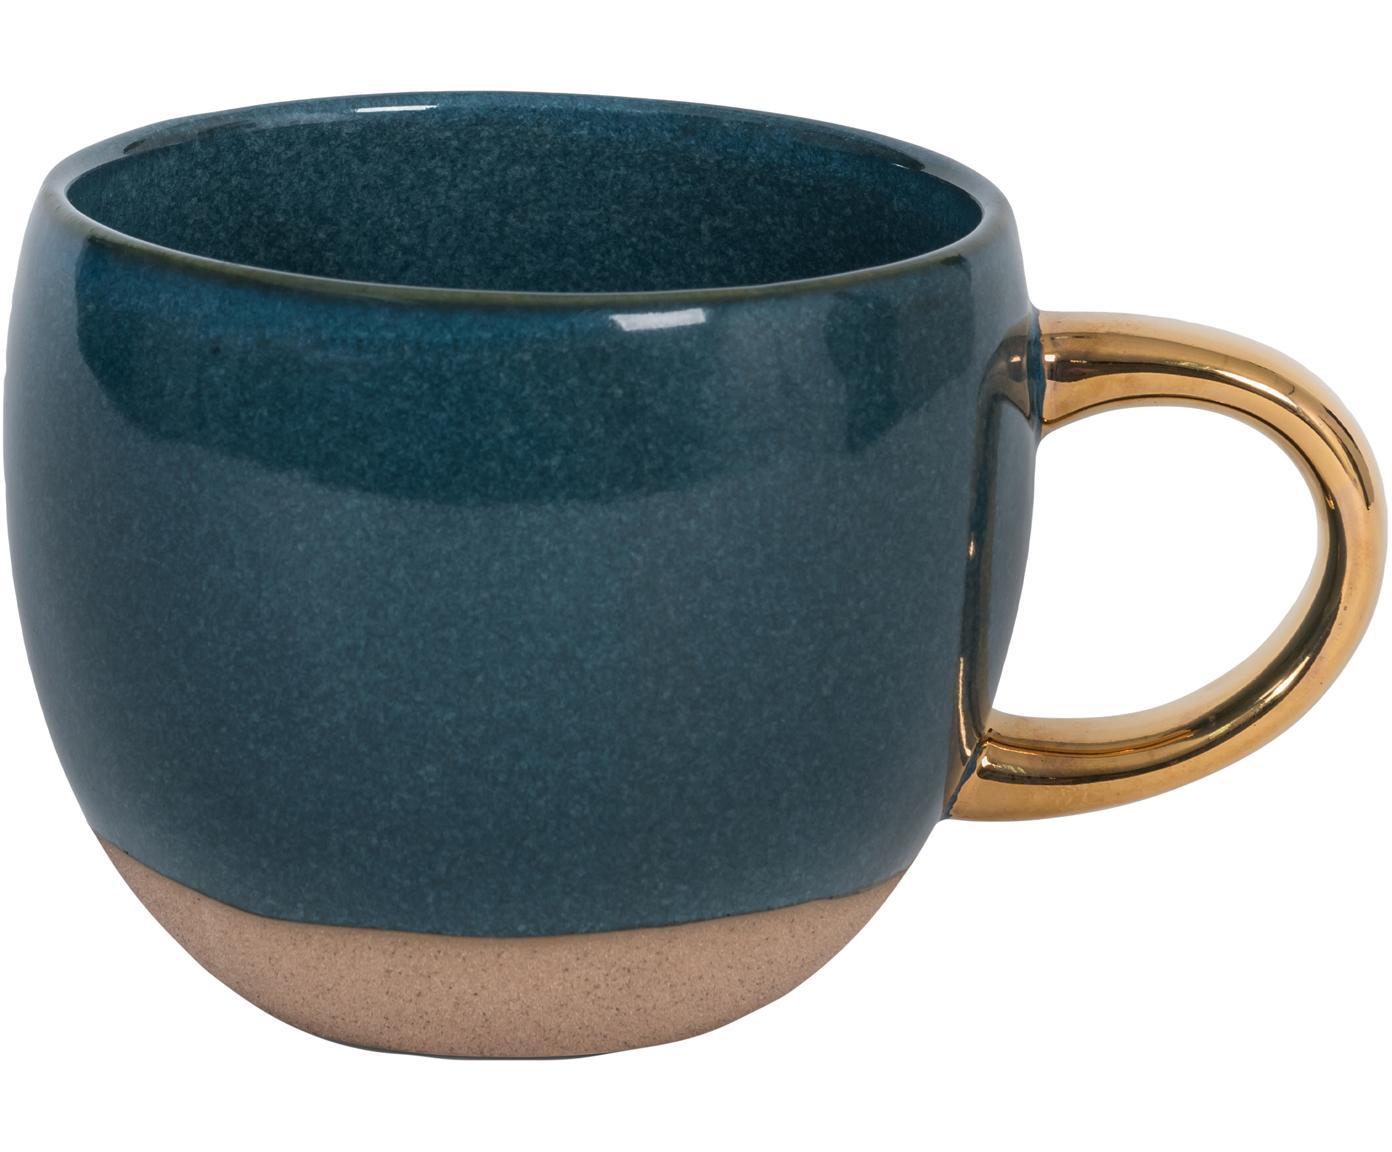 Taza de café Legion, Gres, Azul, dorado, Ø 11 x Al 9 cm